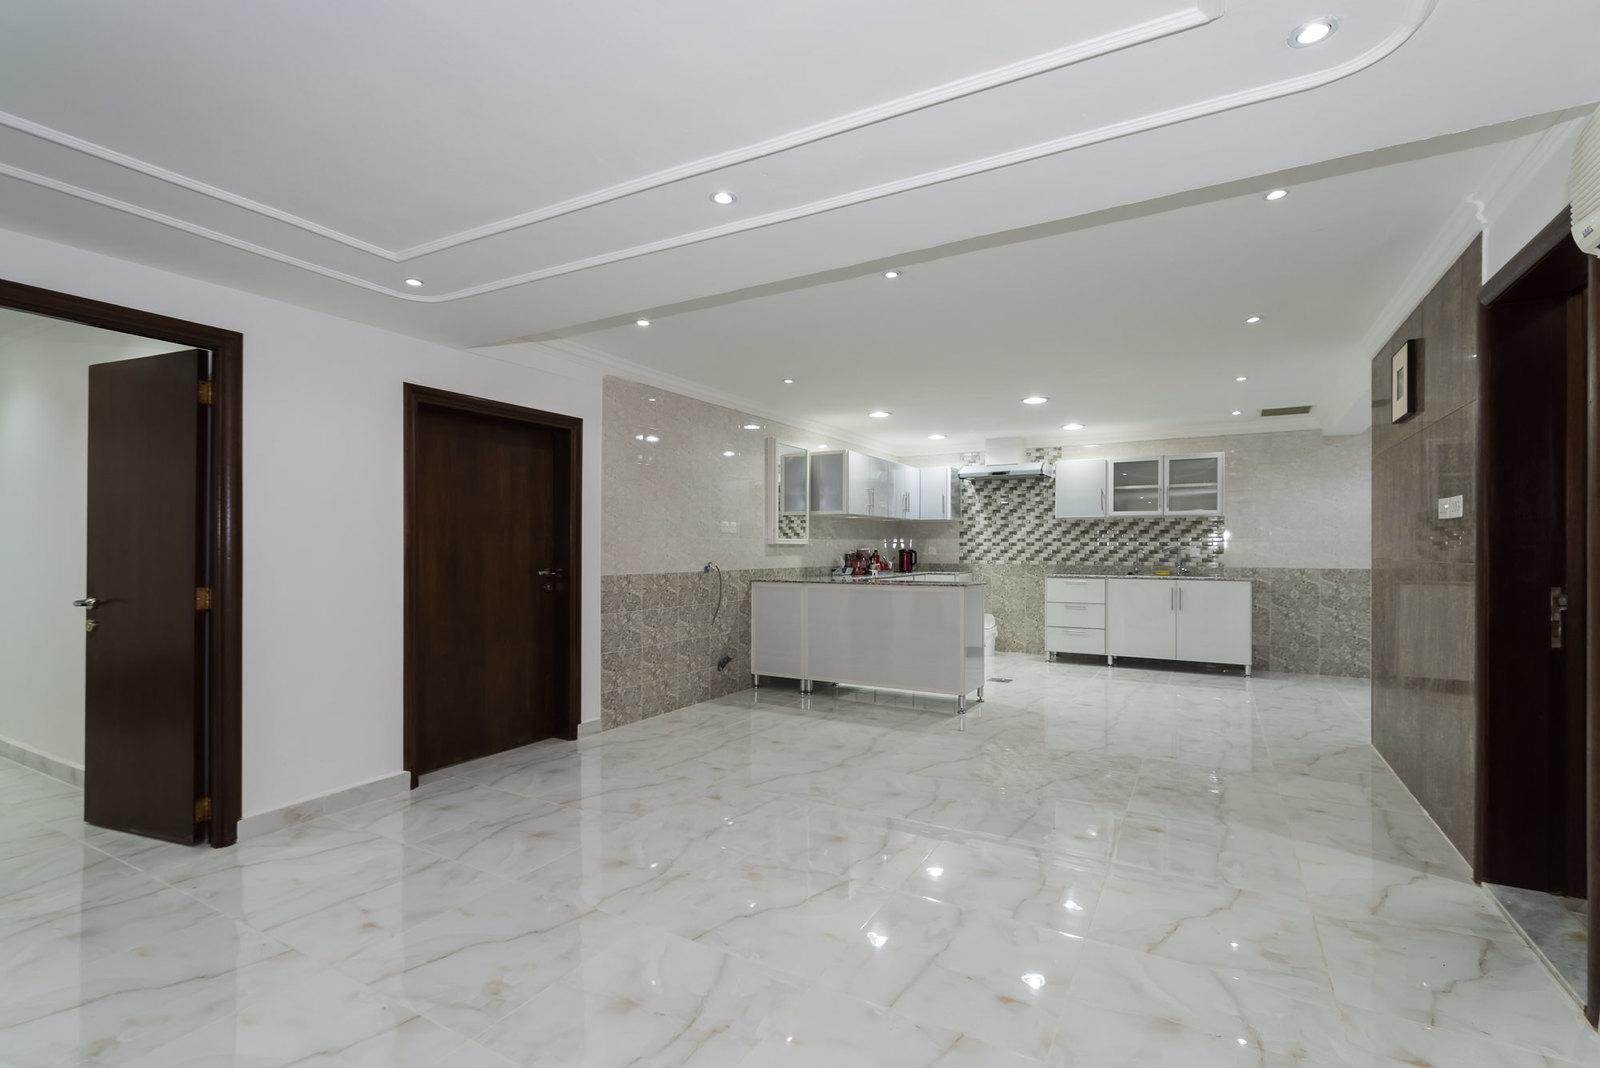 Mangaf – new, unfurnished, two bedroom basement apartment